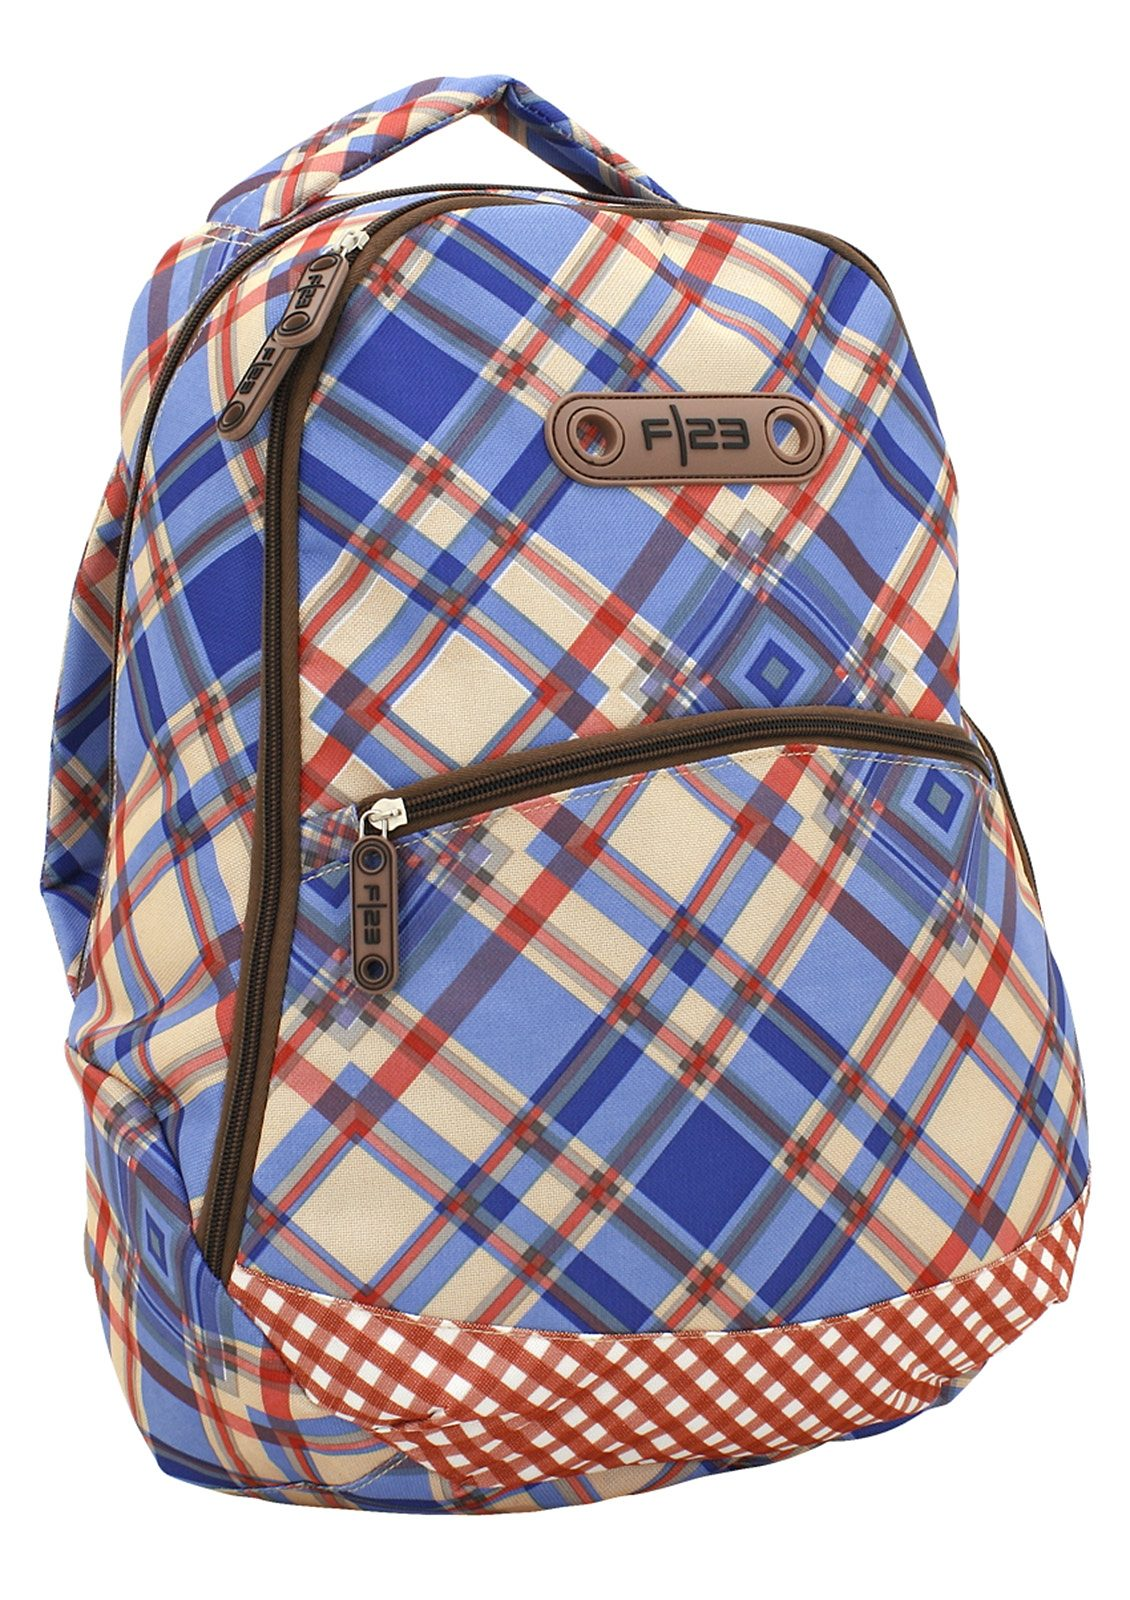 Rucksack mit Laptopfach, »Andiamo - Karo Design«, F23™